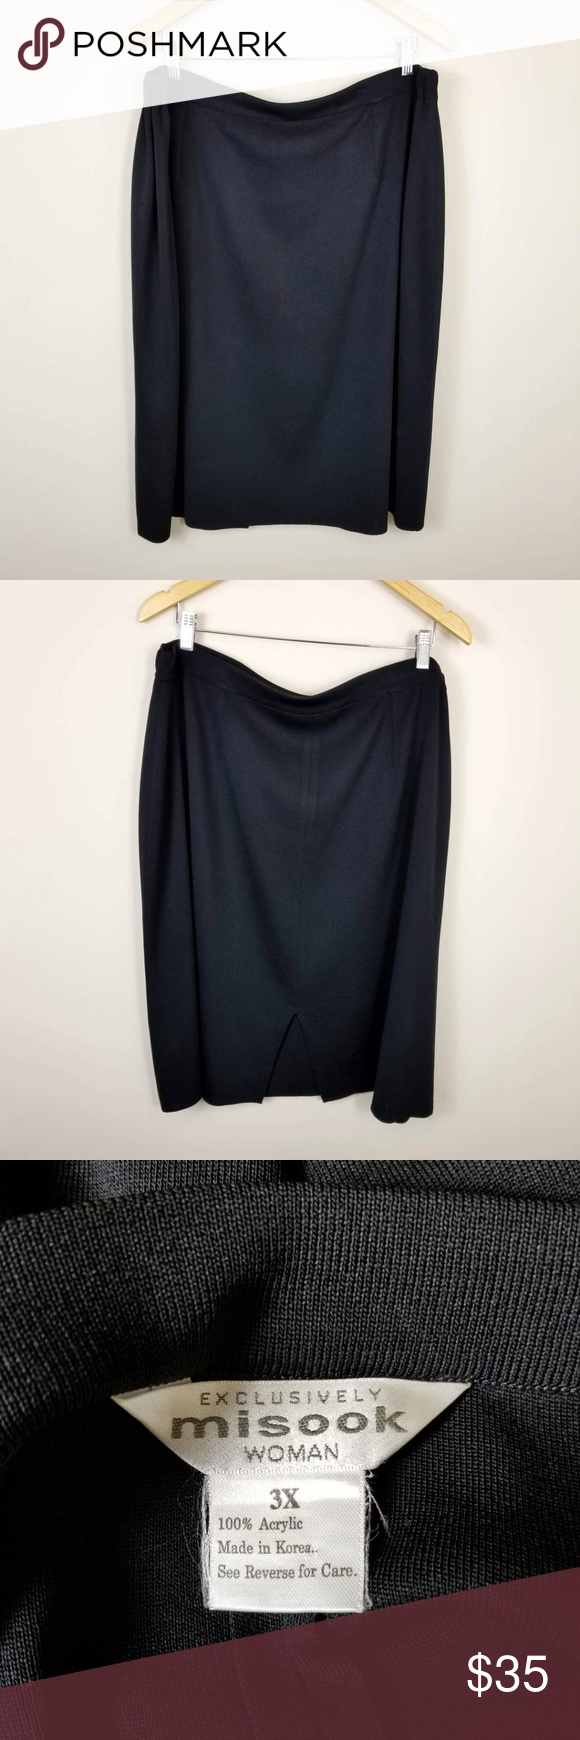 bae1cf3d9e Exclusively Misook Black Acrylic Knit Pencil Skirt Exclusively Misook black  acrylic knit pencil skirt. Elastic